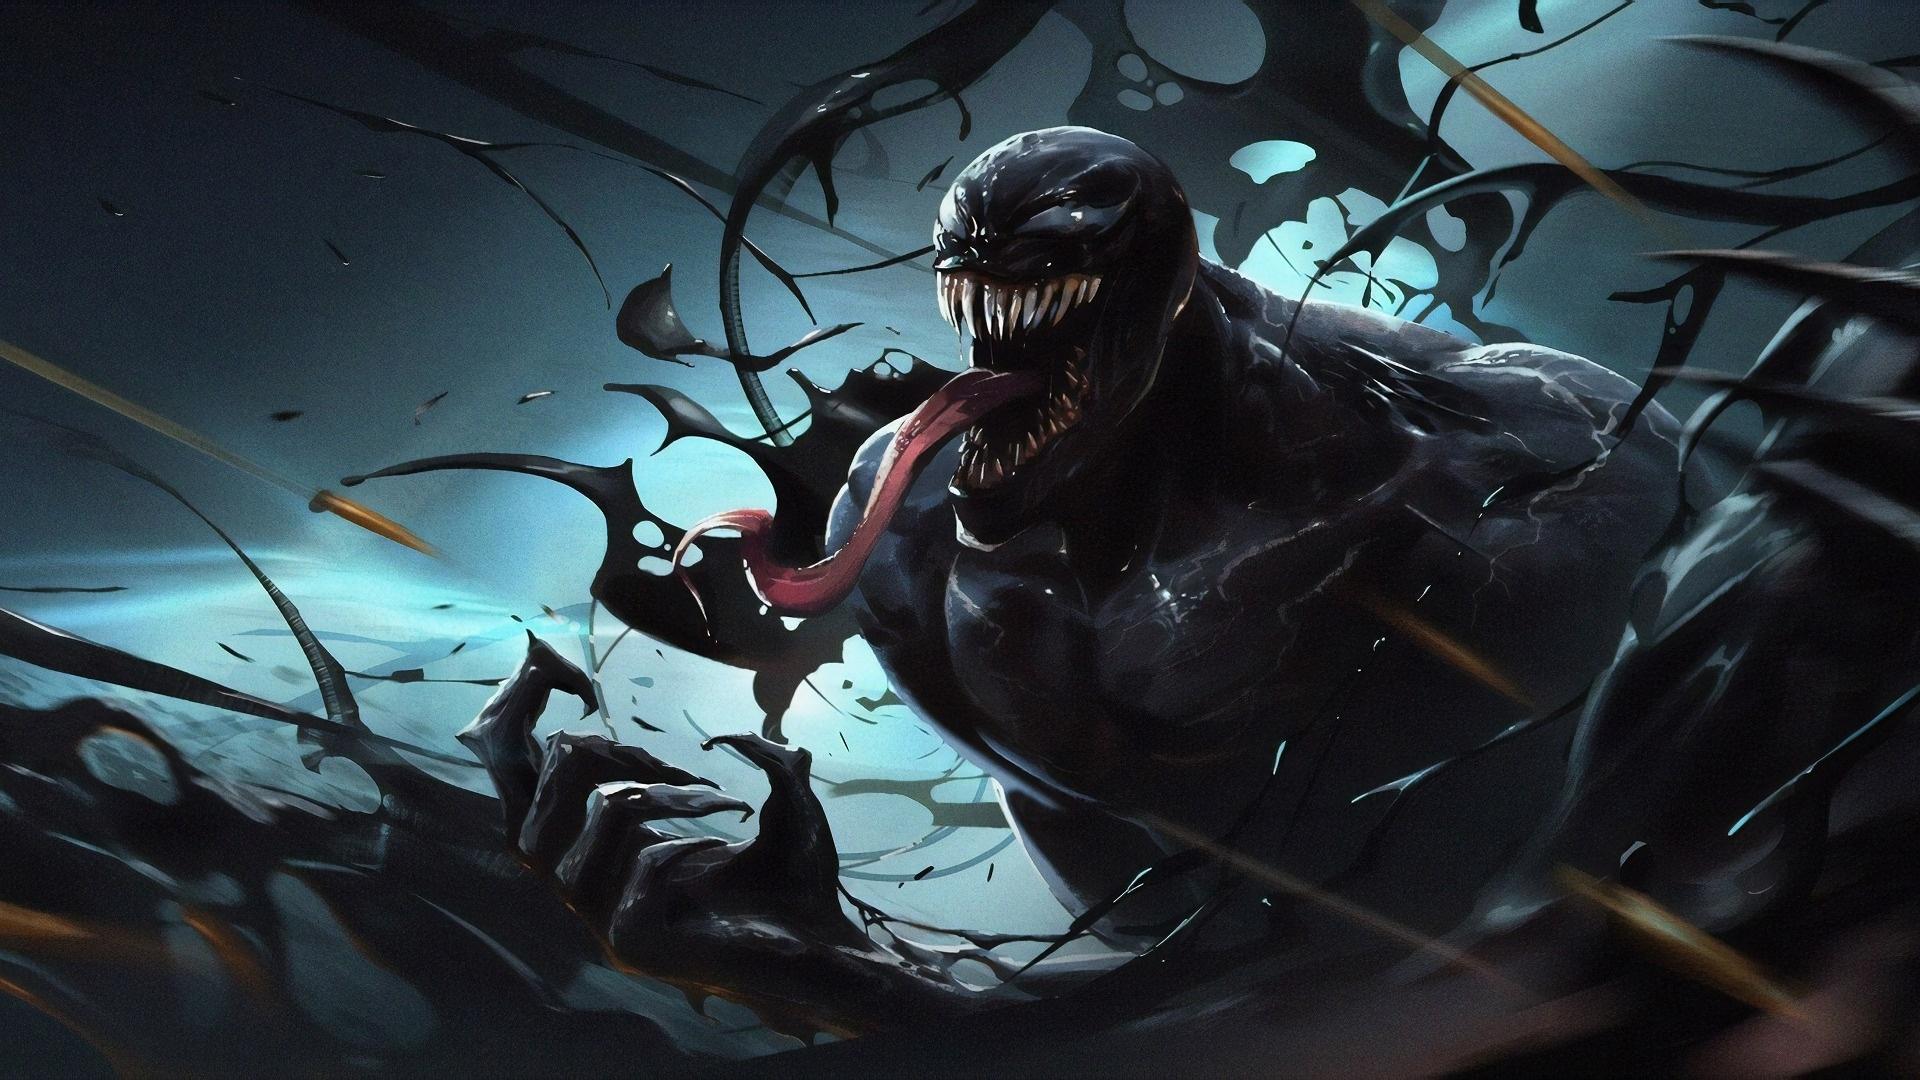 Venom free background